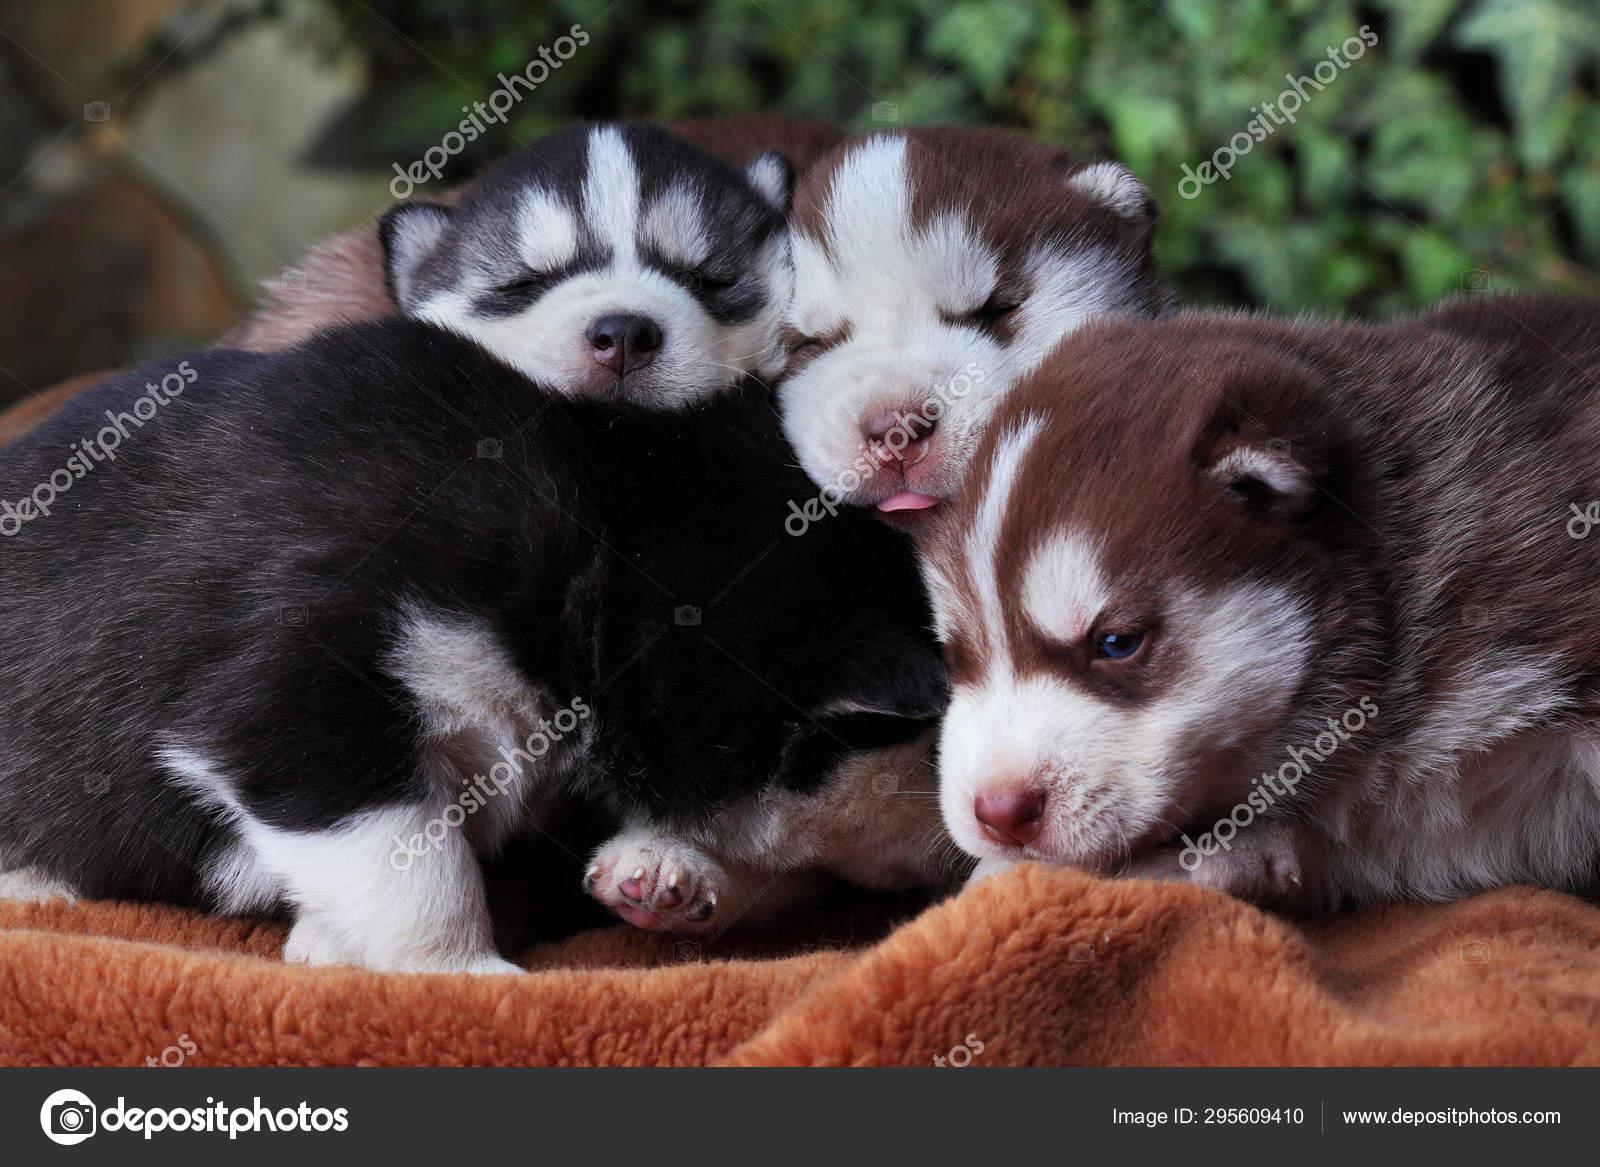 Newborn Siberian Husky Puppy Siberian Husky Siberian Husky Copper And Black Color Sleep On Carpet Stock Photo C Simplesseller Gmail Com 295609410